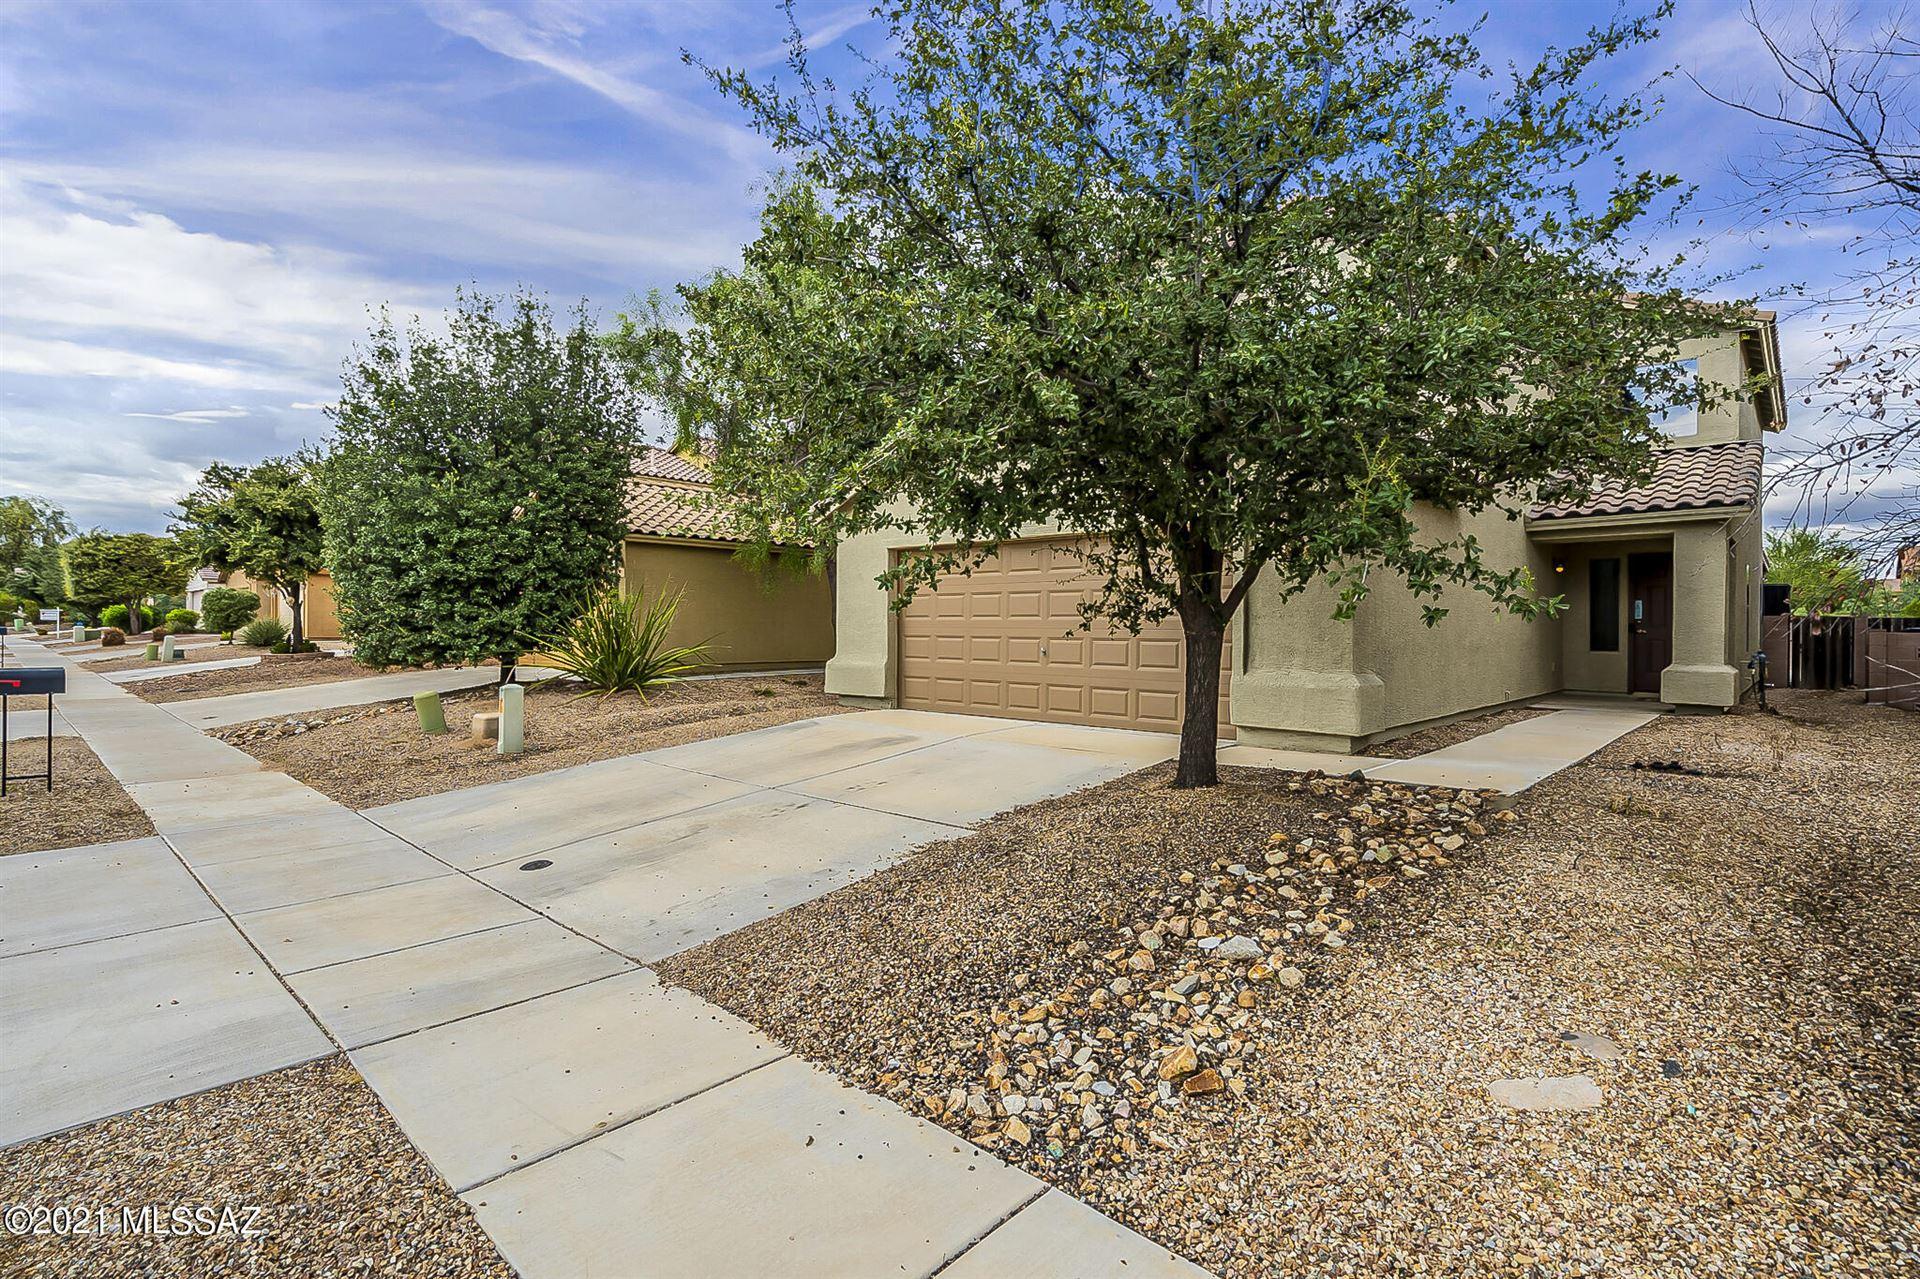 848 W Placita El Cauce Rico, Green Valley, AZ 85614 - MLS#: 22125005